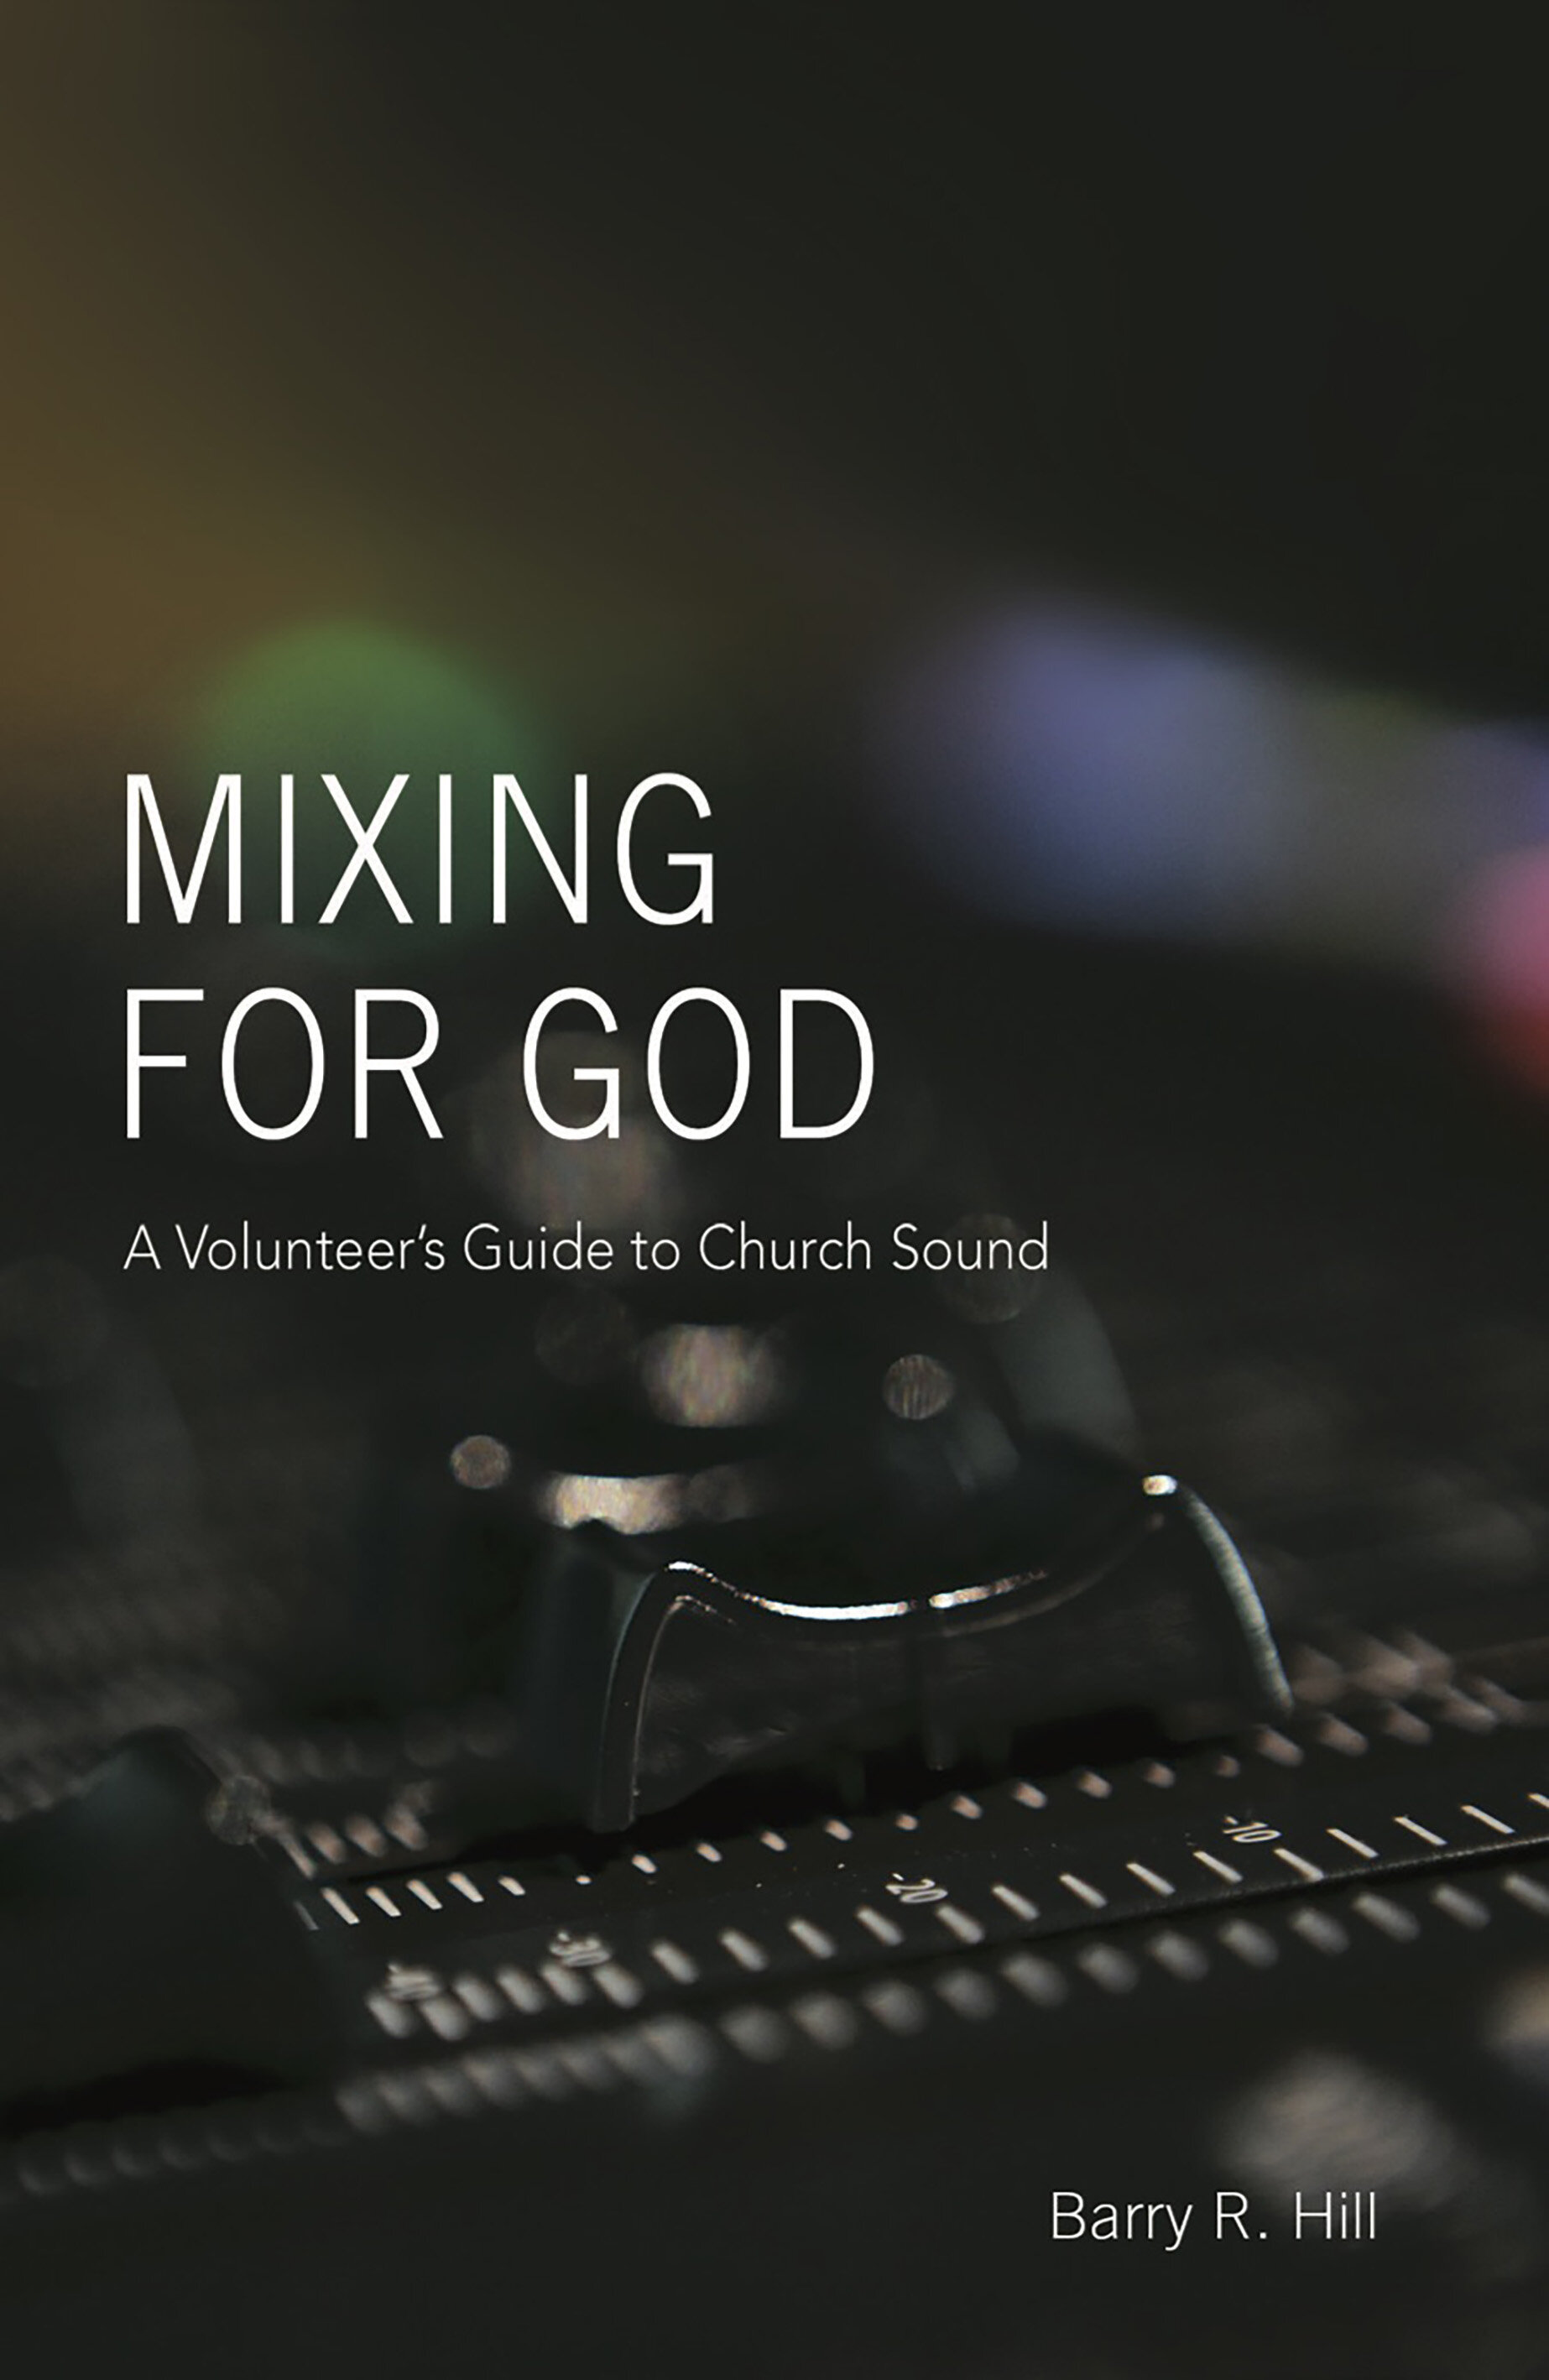 MixingWebCover.jpg